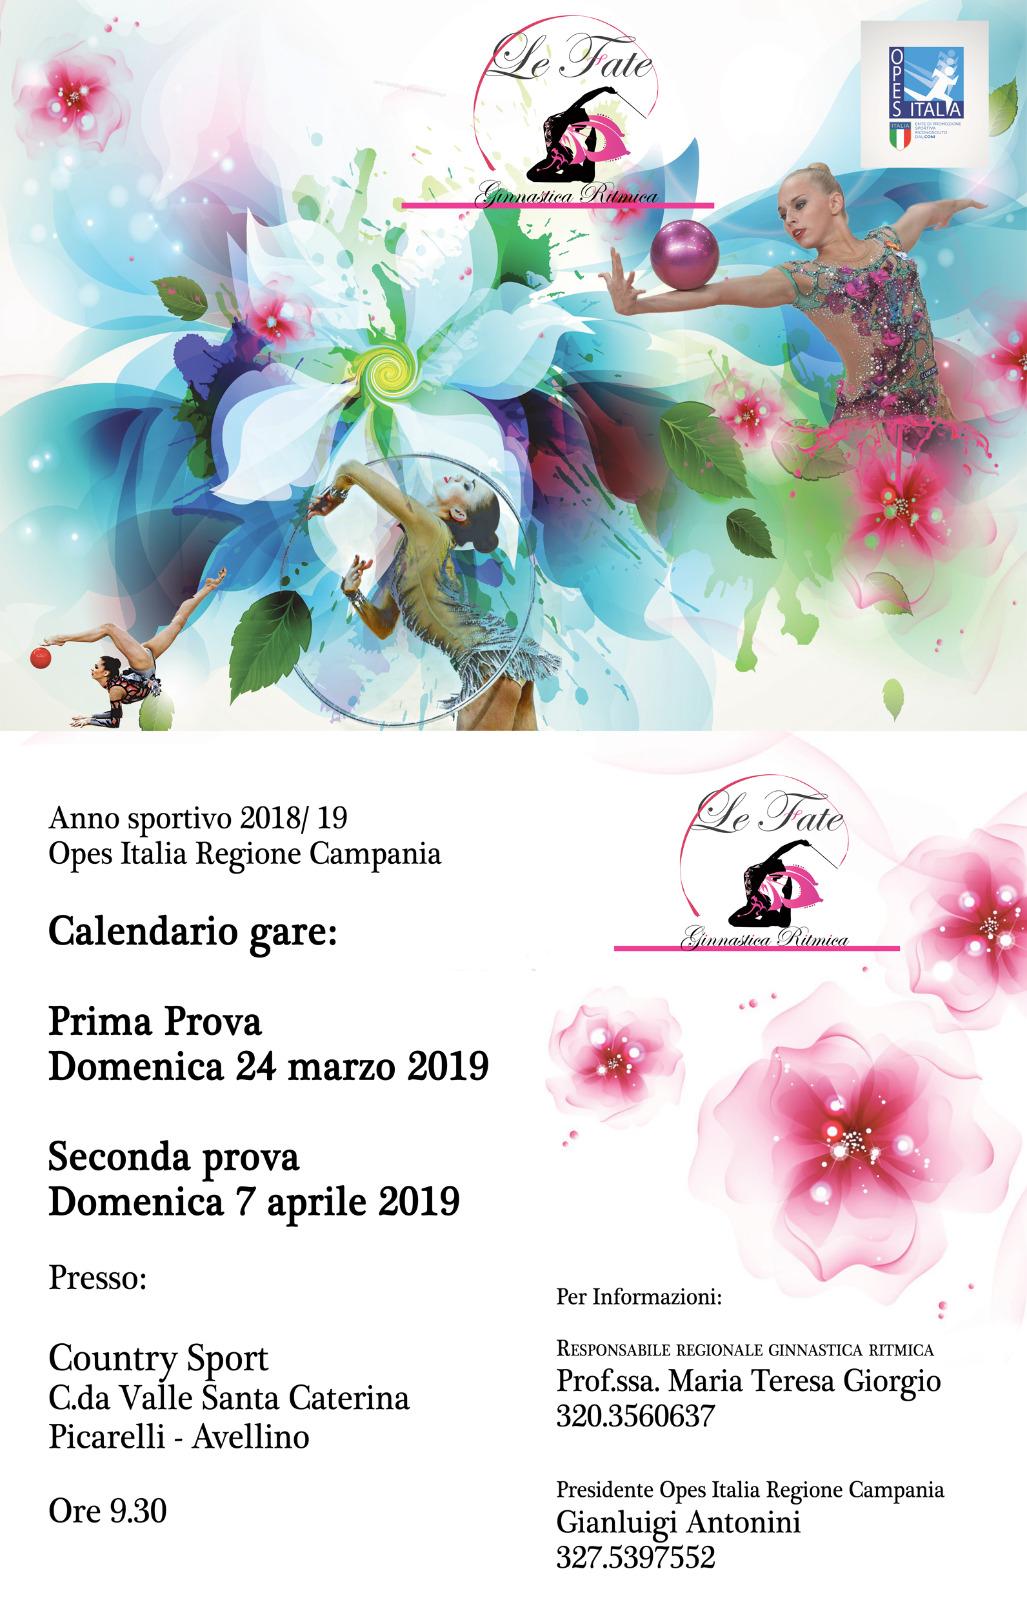 Calendario Regione Campania.Calendario Prove Ginnastica Ritmica 2019 Opes Campania